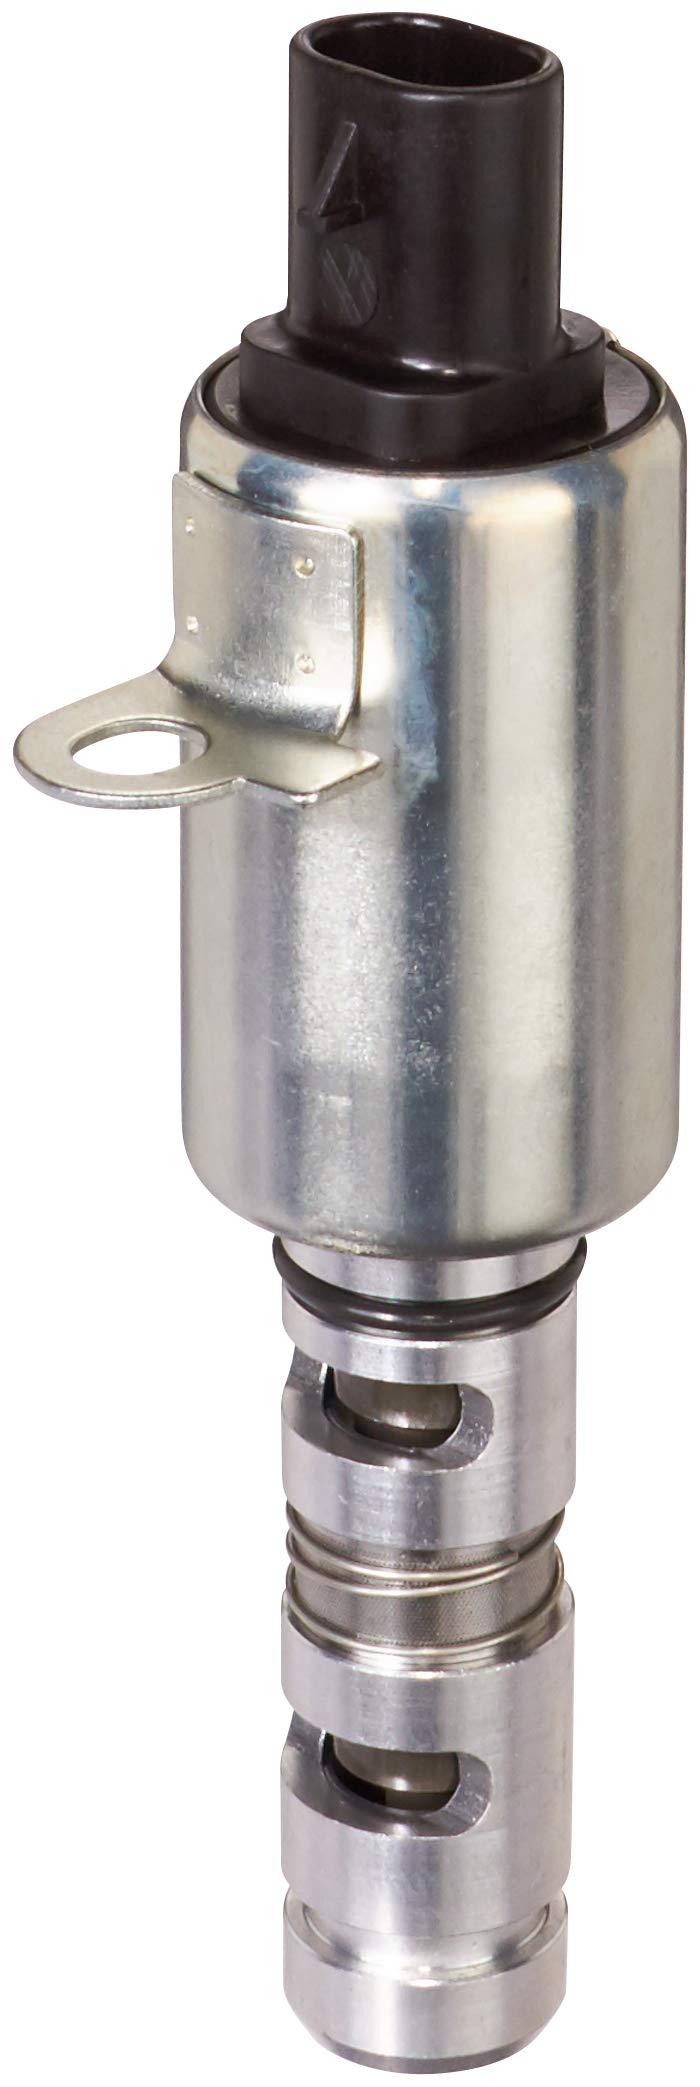 Spectra Premium VTS1021 Variable Valve Timing Solenoid